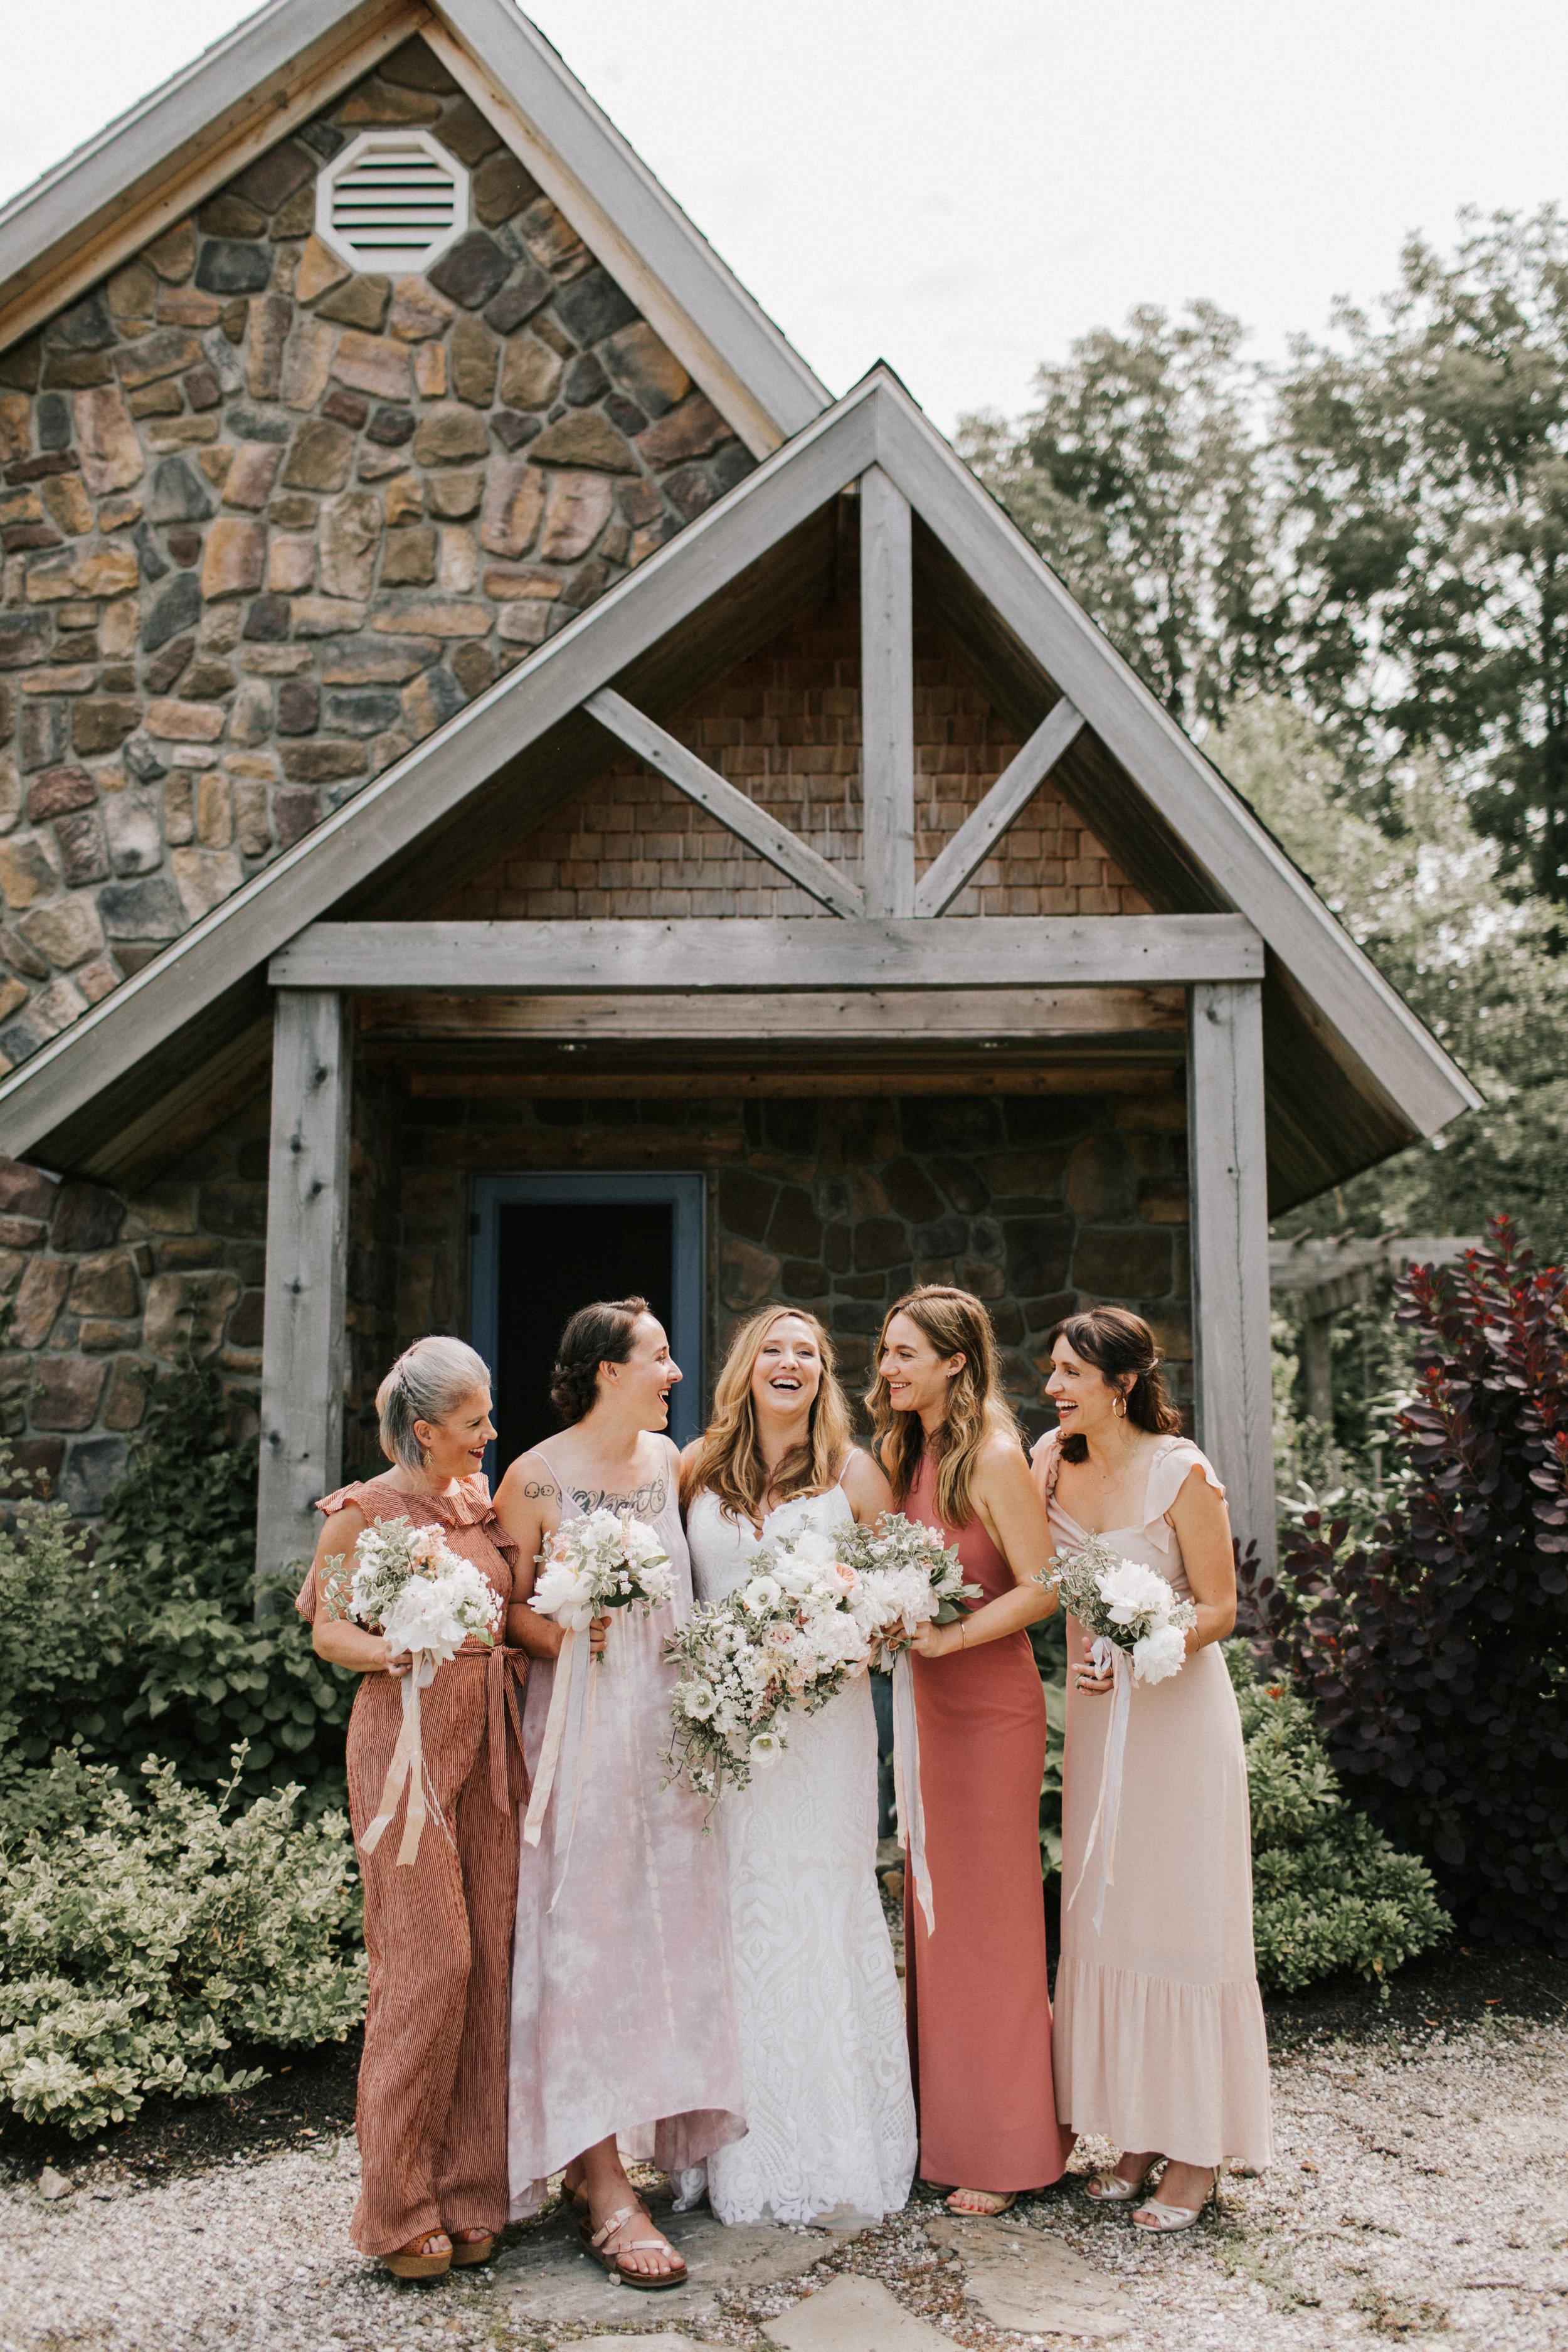 Watershed_Floral_Marianmade_Farm_Wedding_JamieMercurioPhoto2018-151.jpg